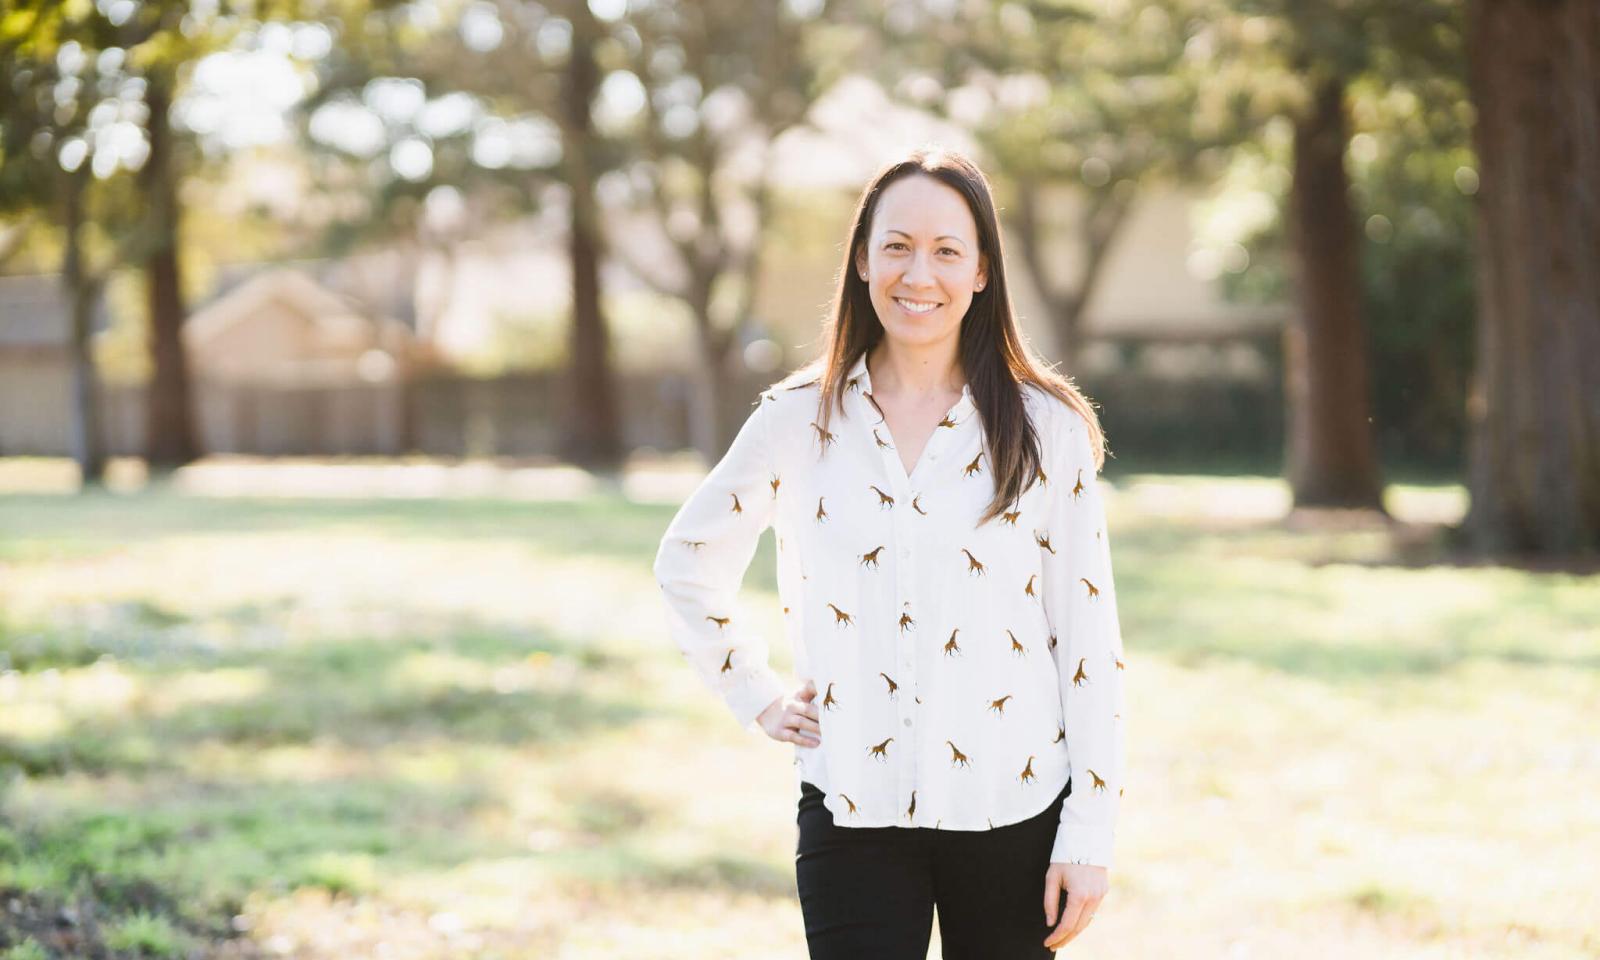 Educator Jennifer Sinclair smiles